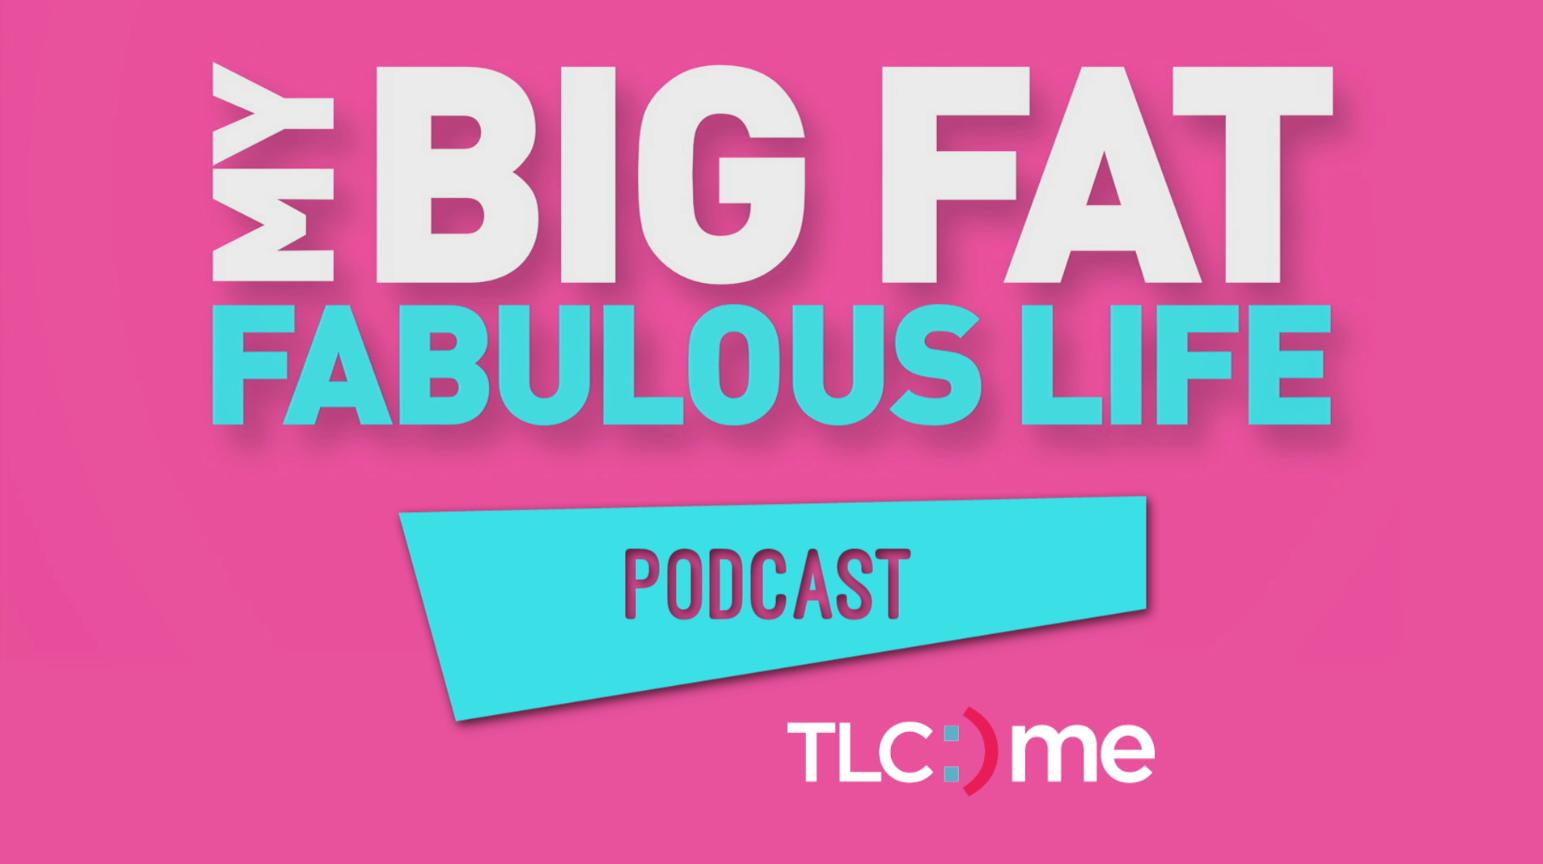 My Big Fat Fabulous Life Podcast